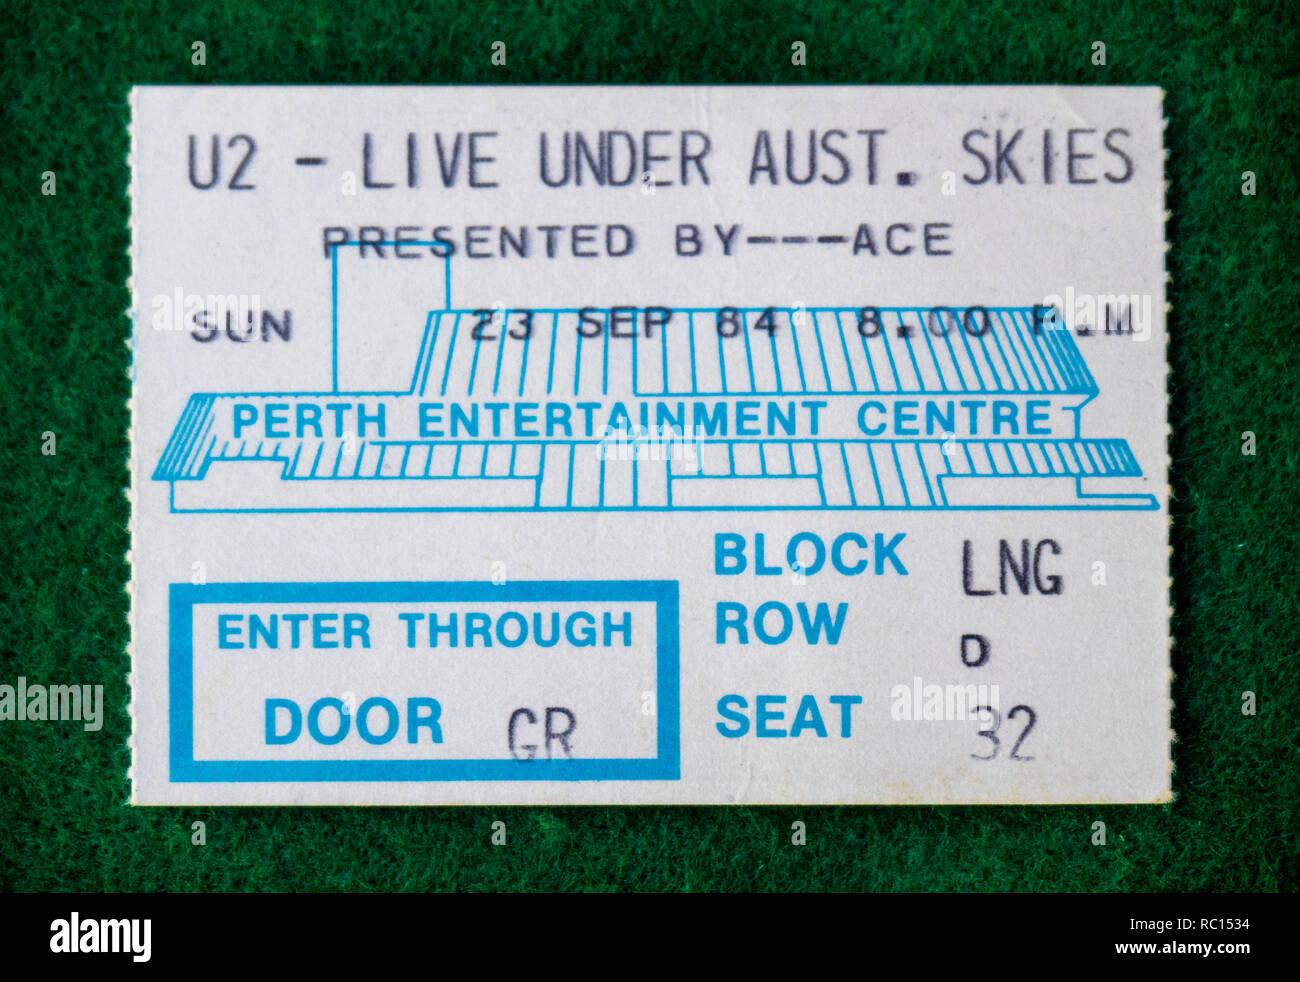 Ticket for U2 concert at Perth Entertainment Centre in 1984 WA Australia. - Stock Image